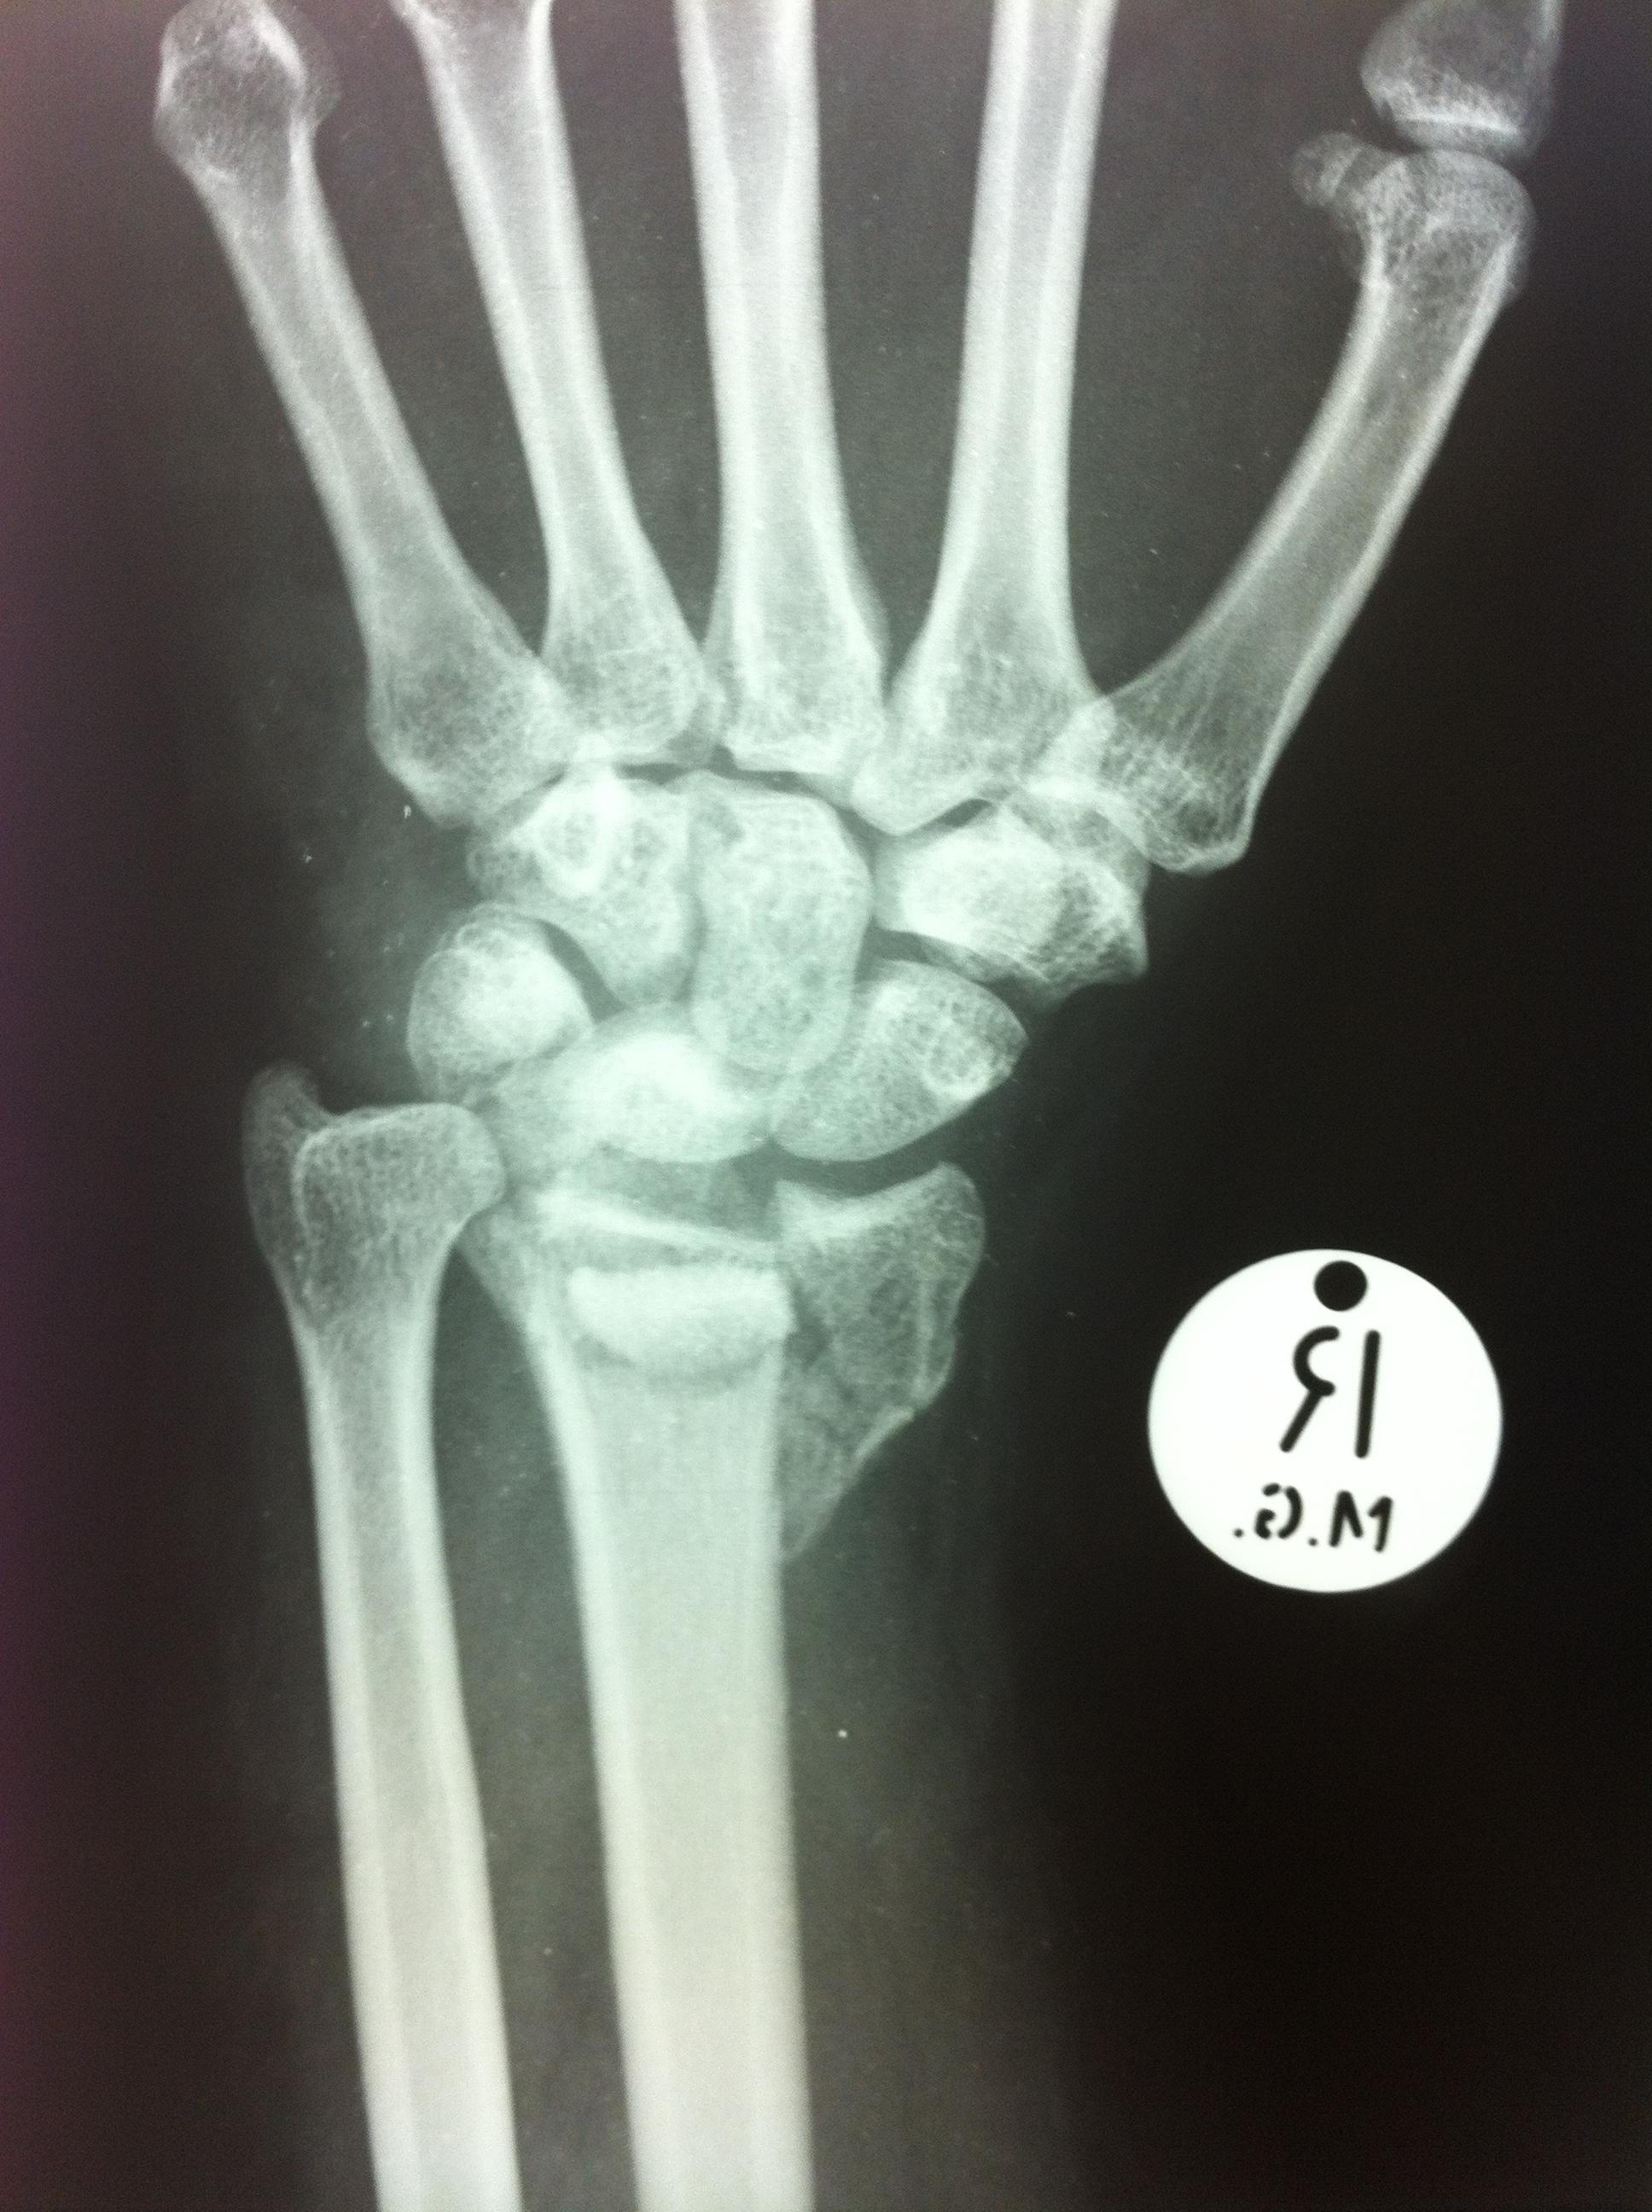 Xray - Pre-op radius fracture